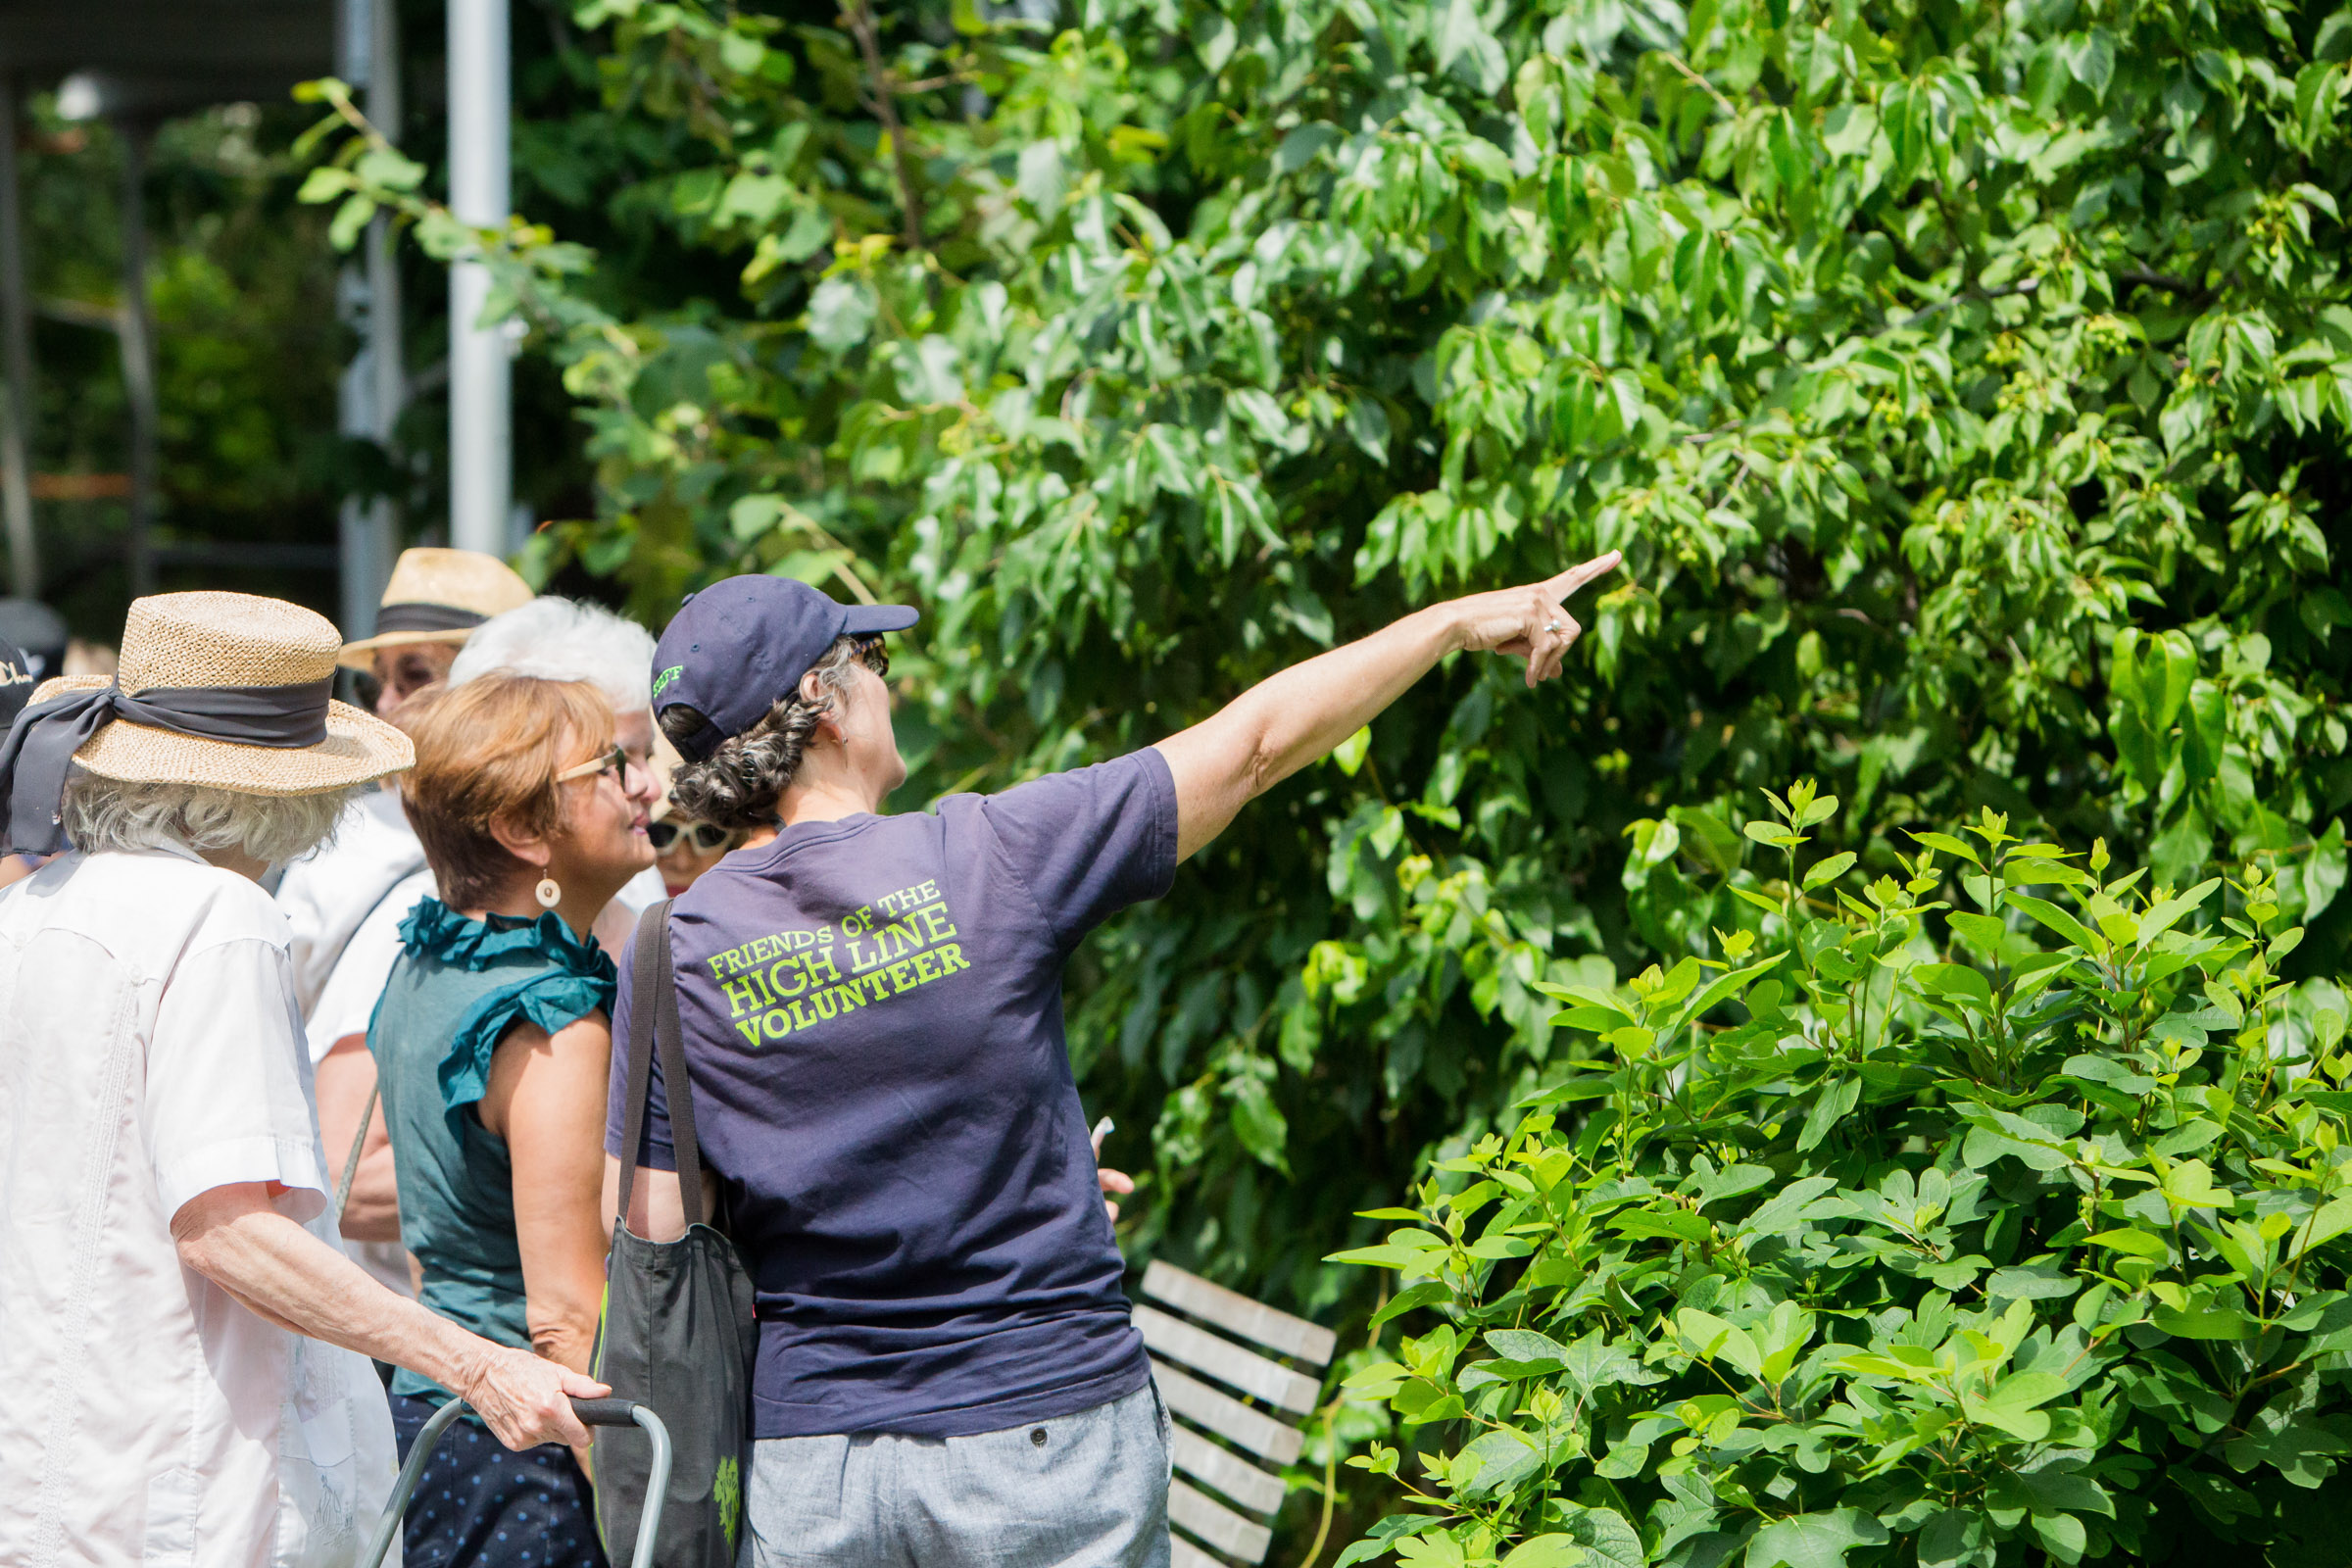 Volunteers | The High Line